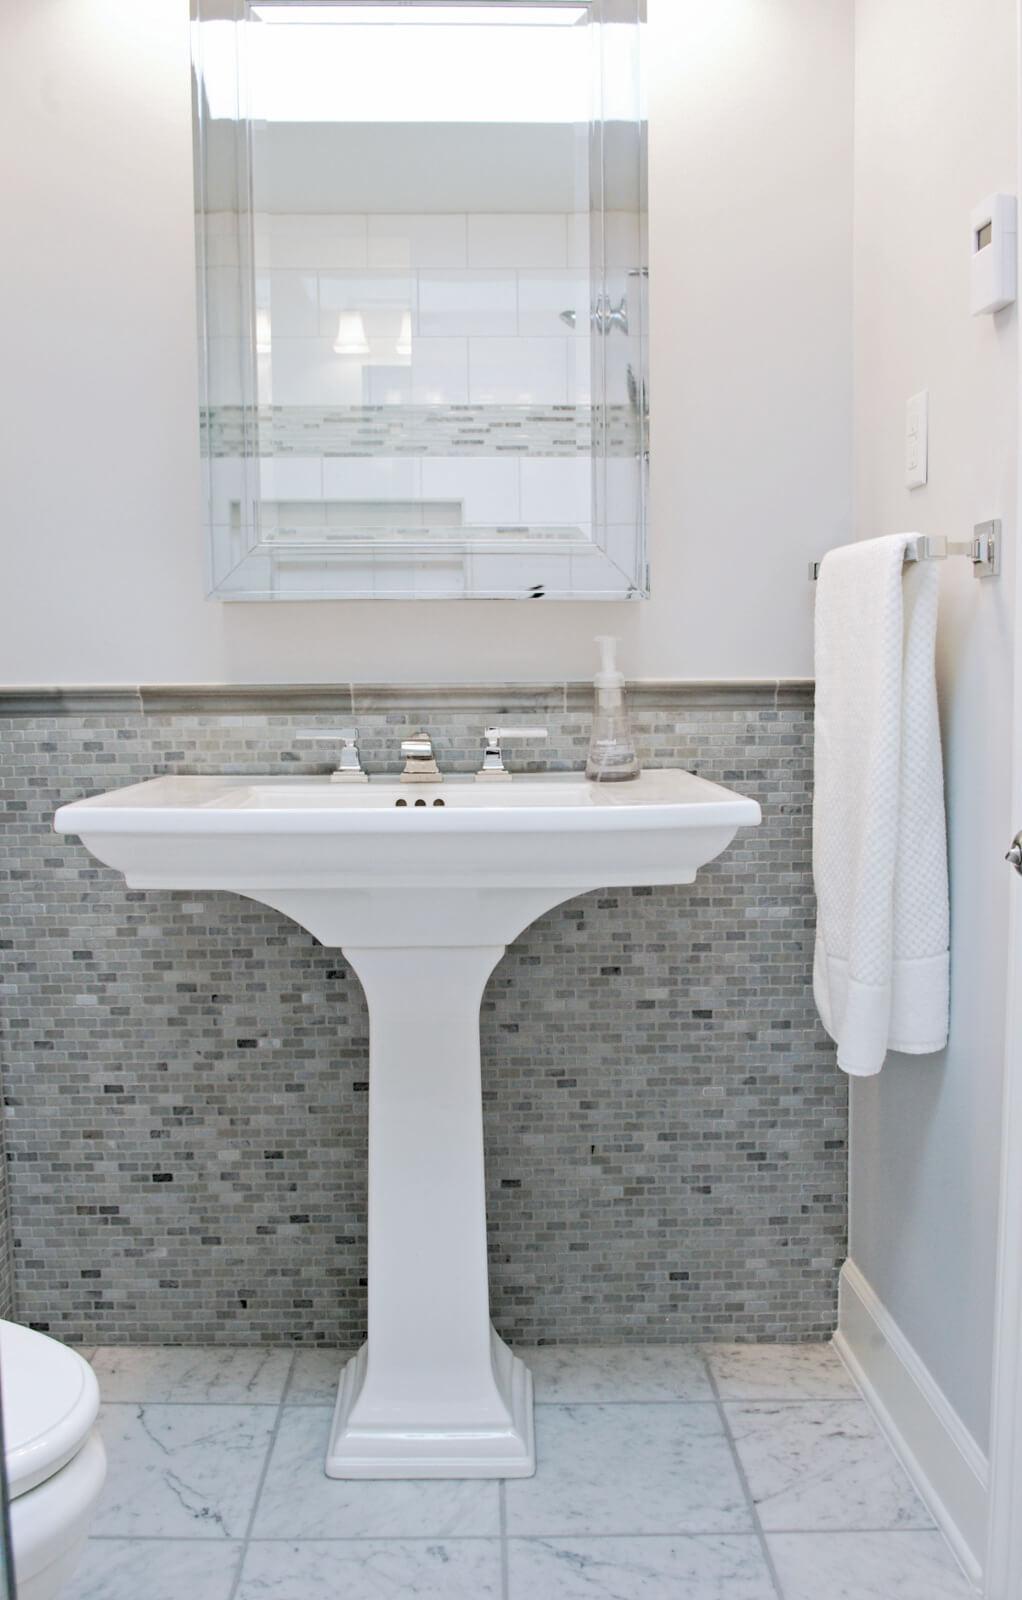 Cordova Bathroom Renovation - All Canadian Renovations Ltd. - Bathroom Renovations Winnipeg, Manitoba